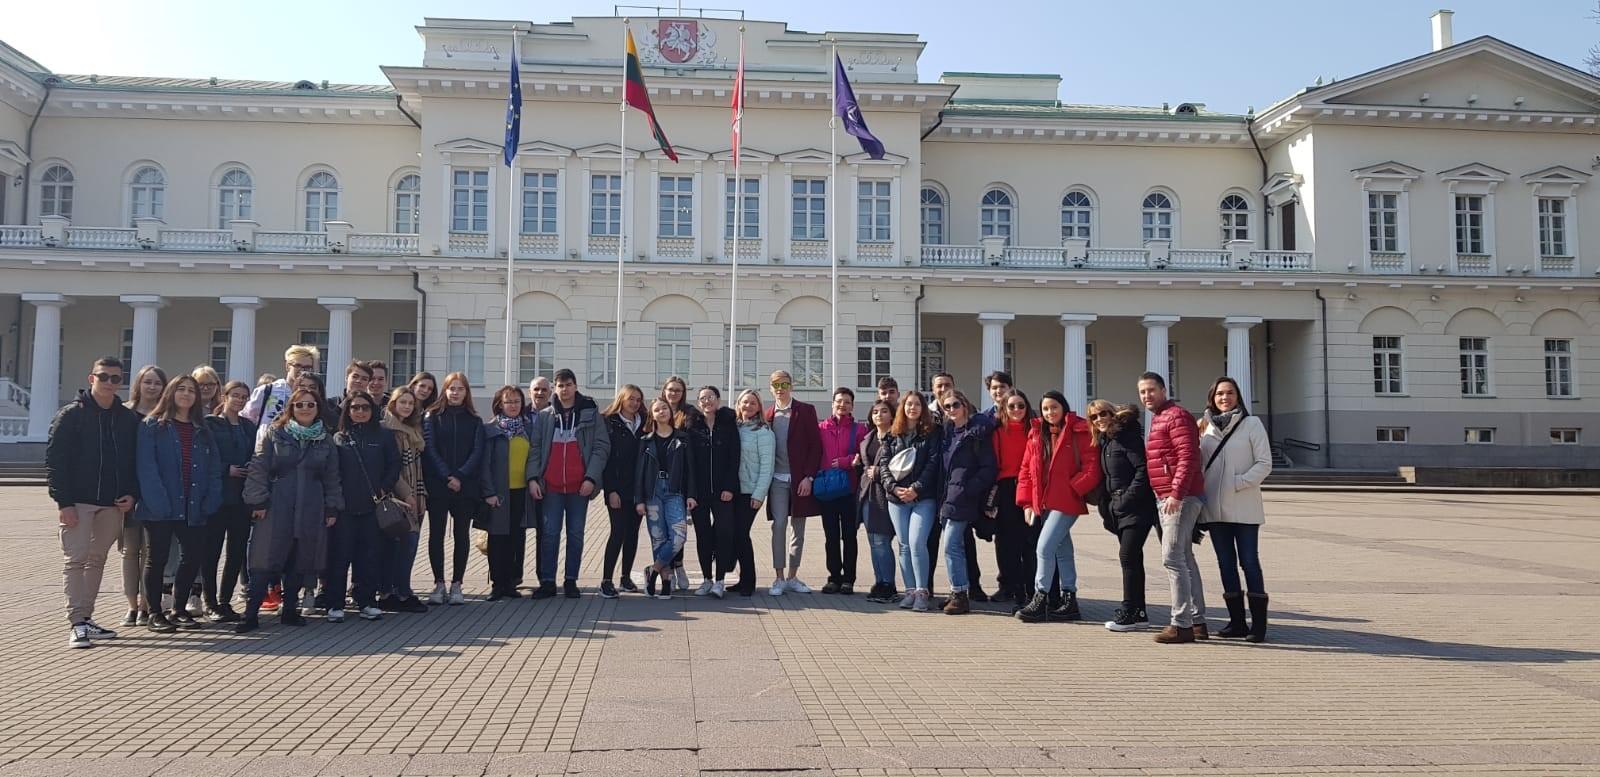 b04b32e162c ... STOP CONSUMPTION FRENZY στο οποίο συμμετέχει το 2ο Γενικό Λύκειο Βόλου,  φιλοξενήθηκε στο Βίλνιους της Λιθουανίας από τις 6 έως τις 13 Απριλίου 2019.